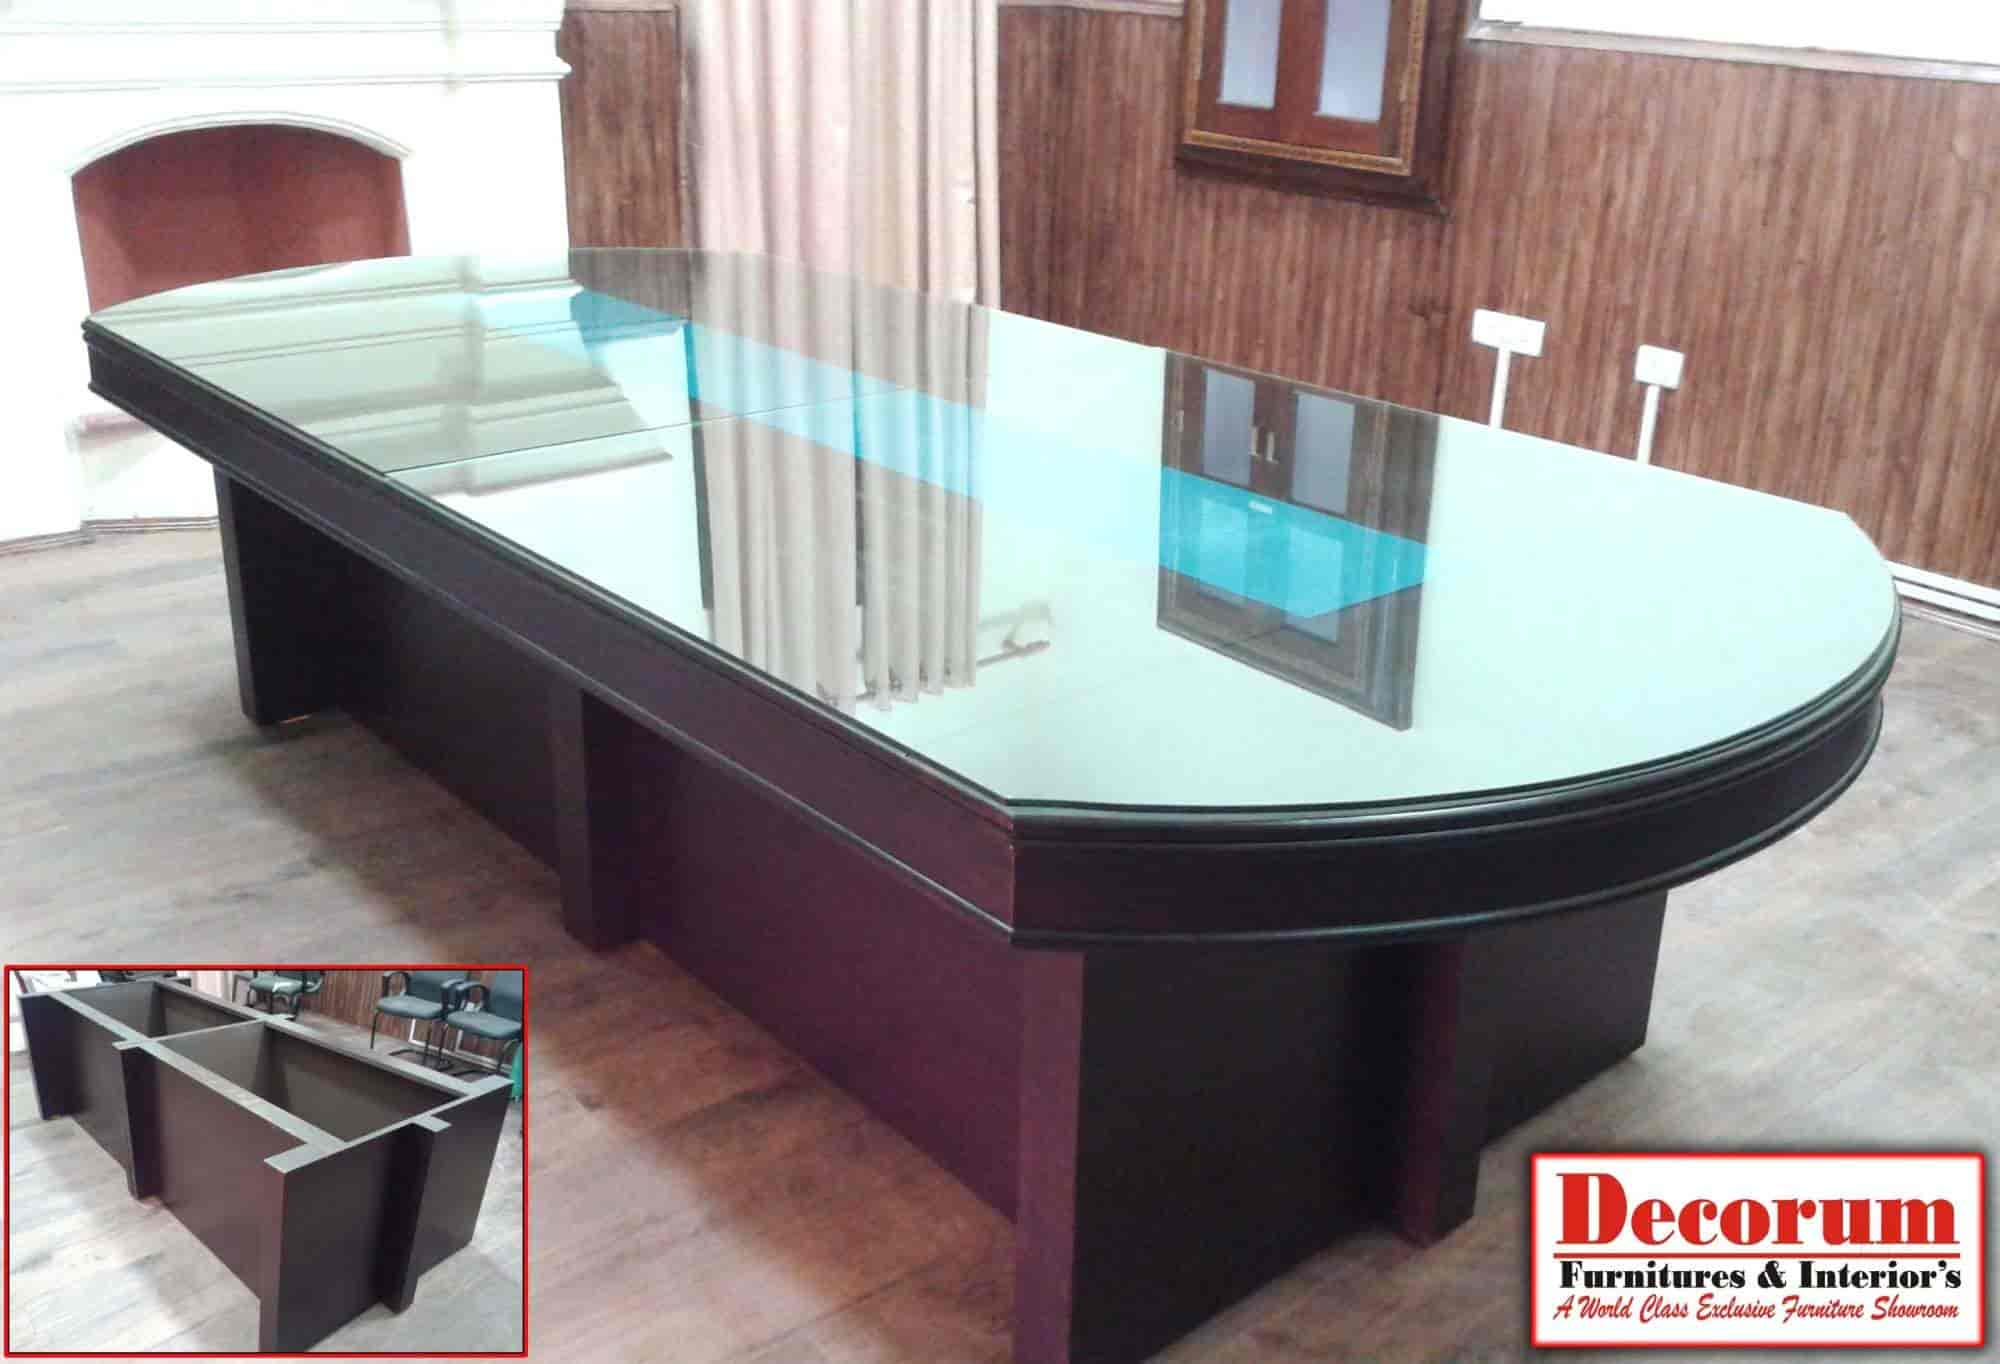 Decorum Furnitures Interiors Furniture Dealers in Haldwani